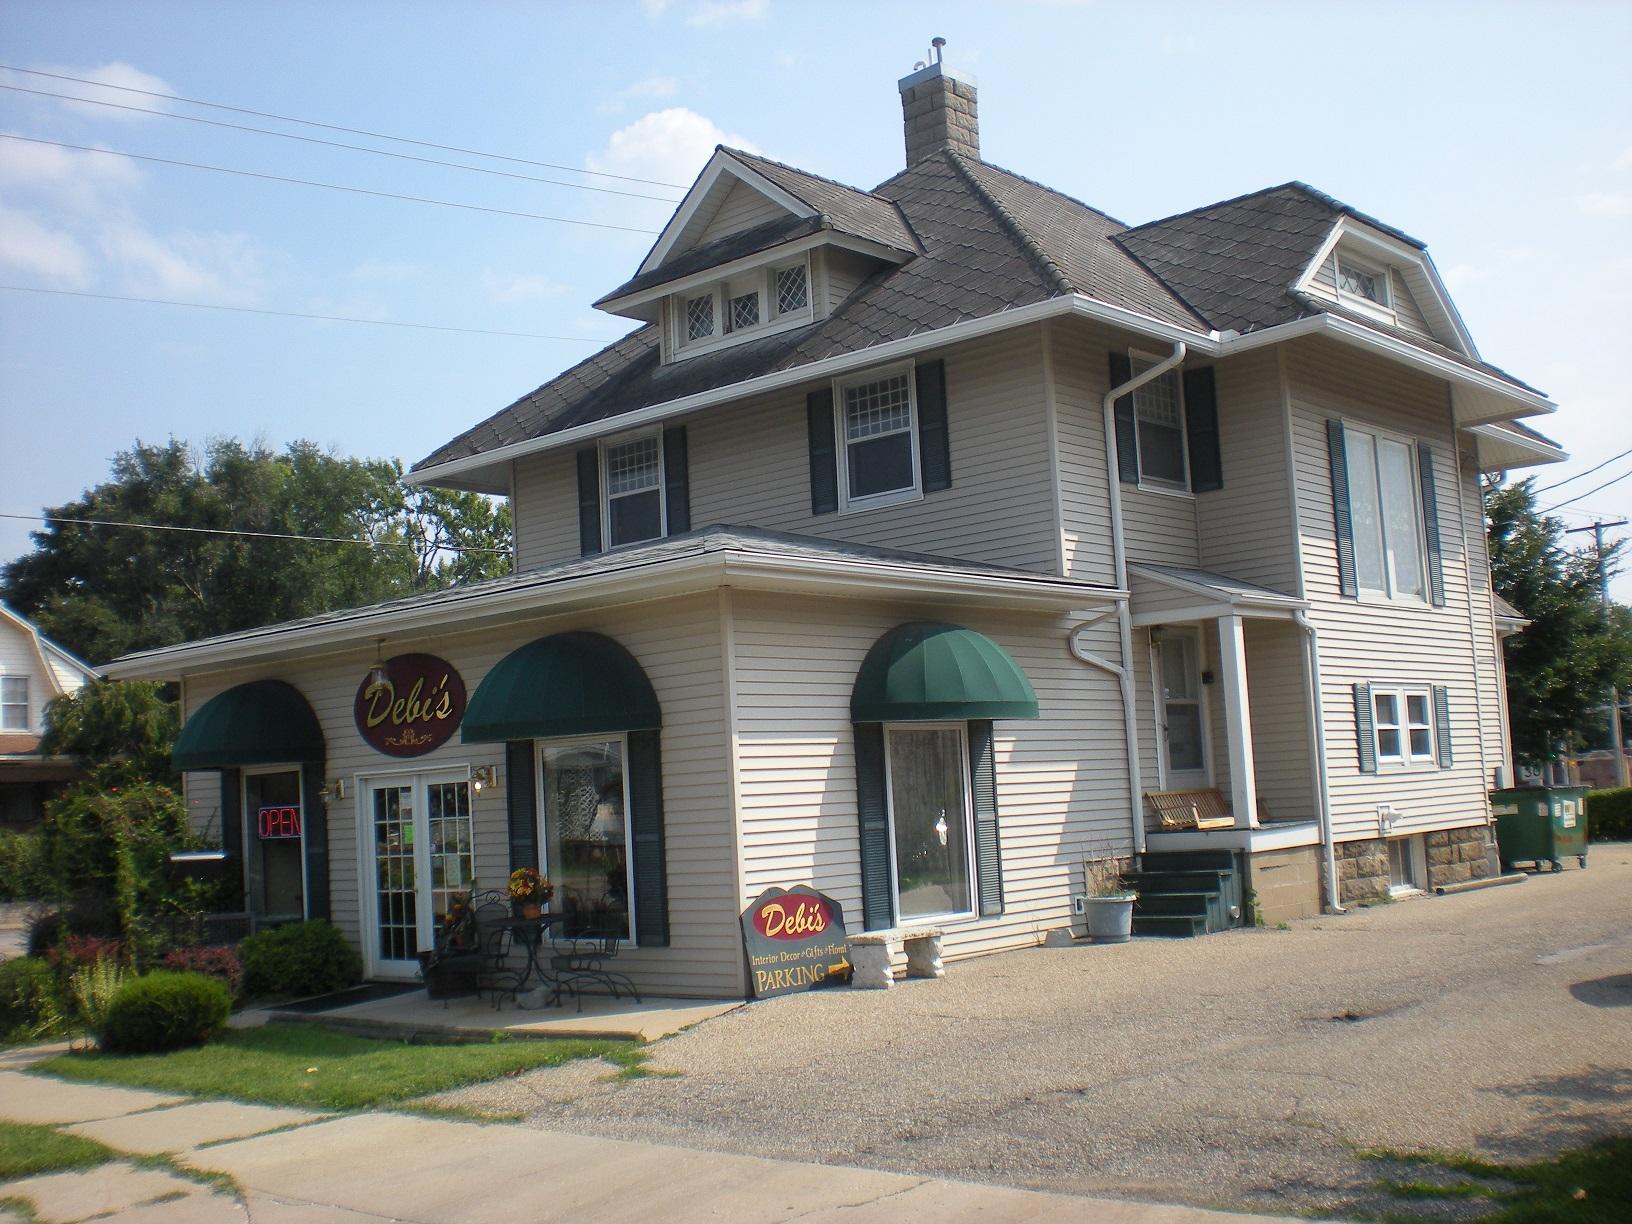 233 E Carroll St, Macomb, IL 61455, Macomb, Illinois 61455